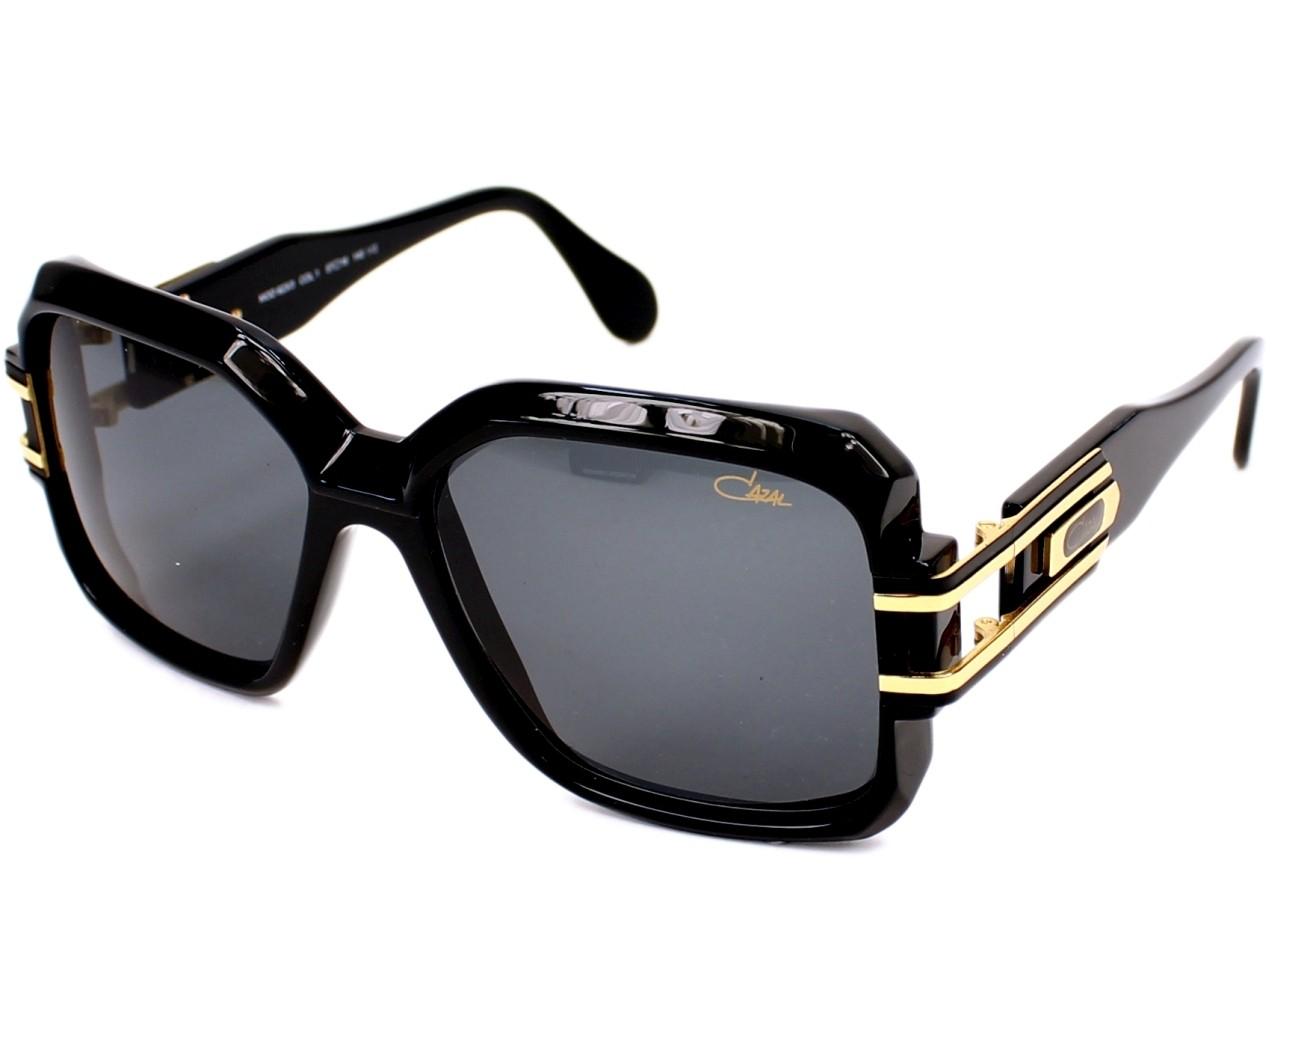 Cazal Sunglasses 623 3 001 Black Visionet